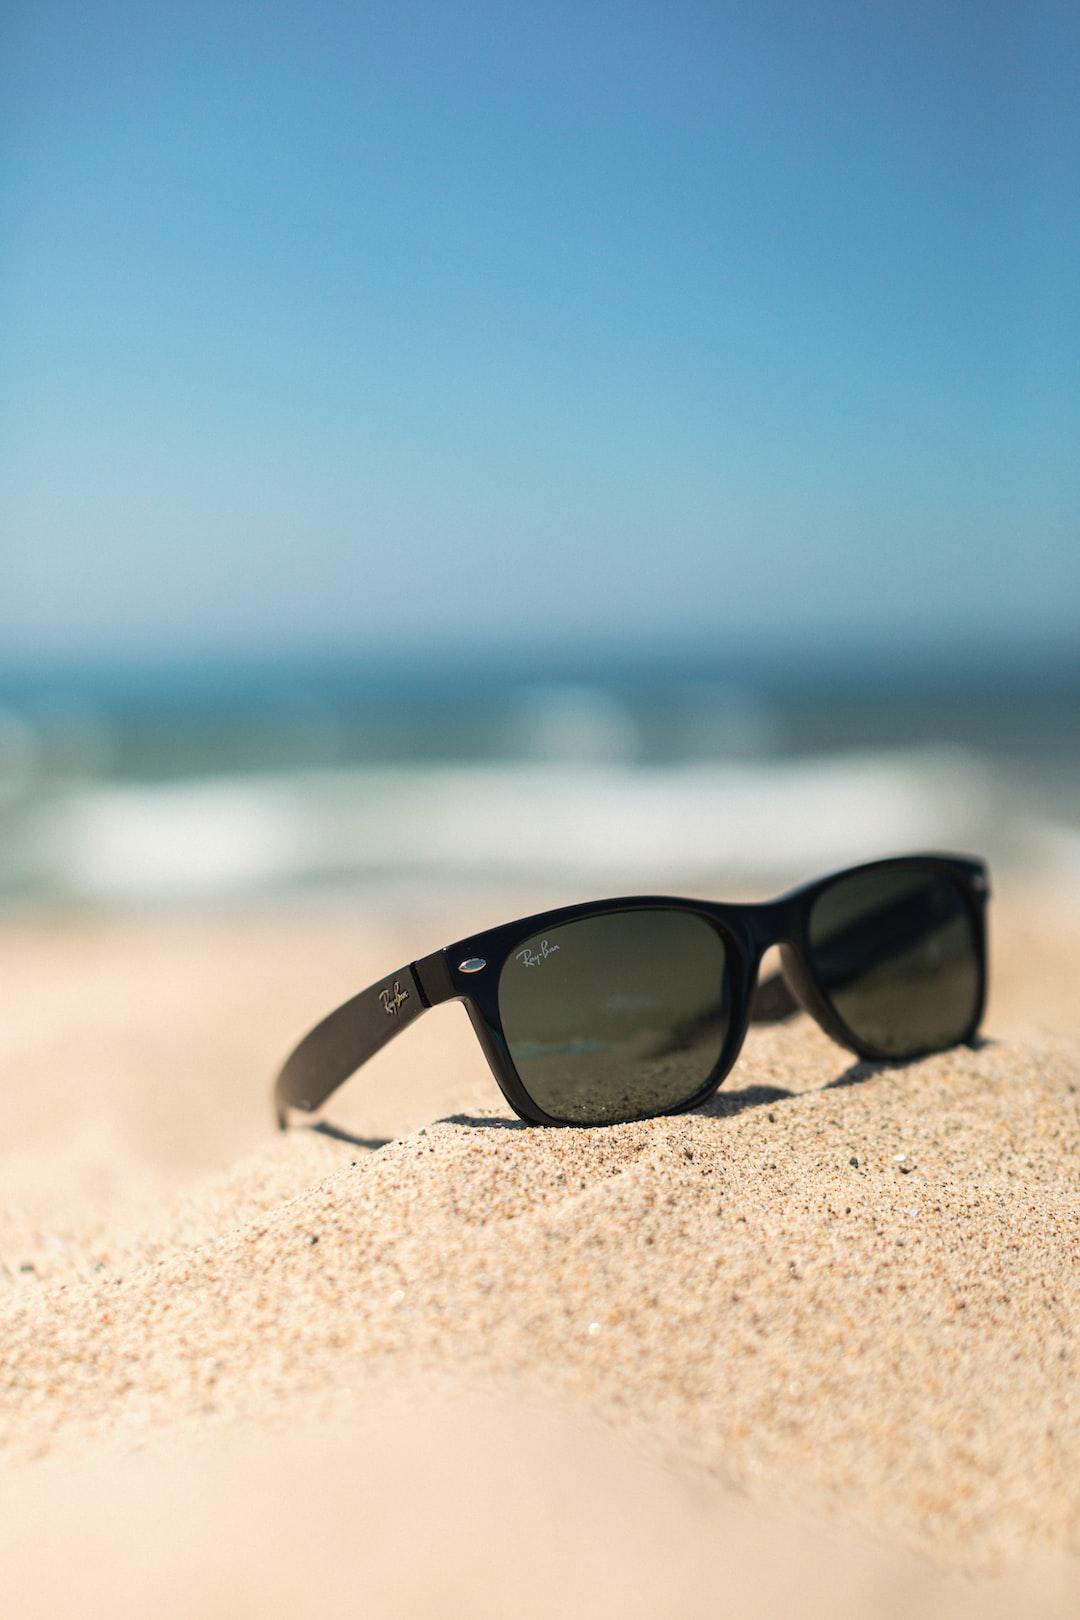 Sandglasses.